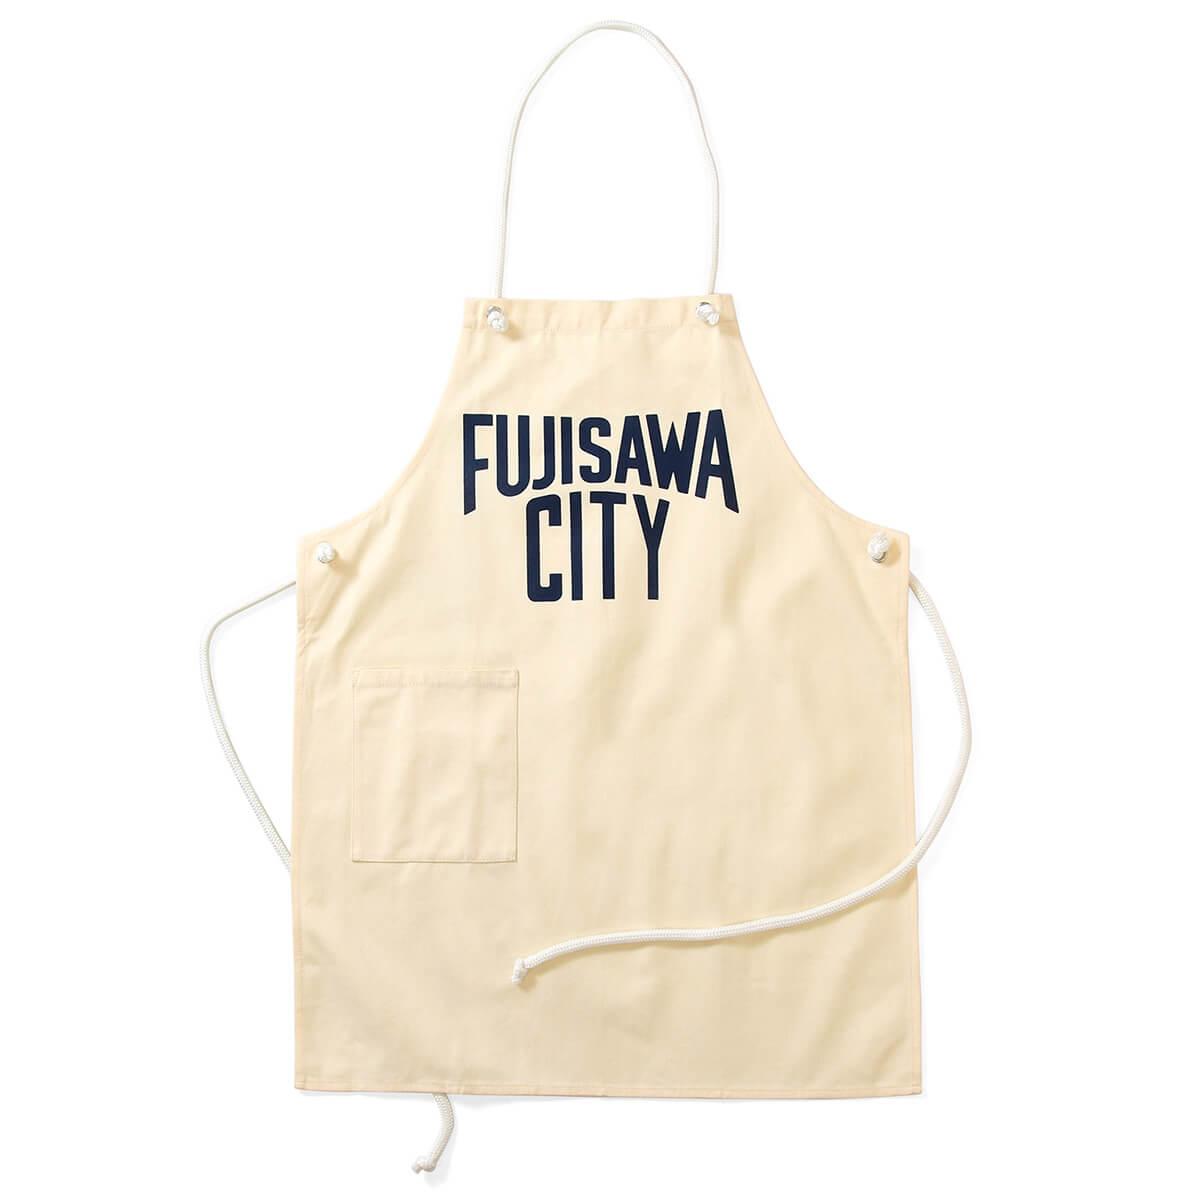 FUJISAWA CITY フジサワシティ LOGO CANVAS APRON エプロン OFF WHITE オフホワイト